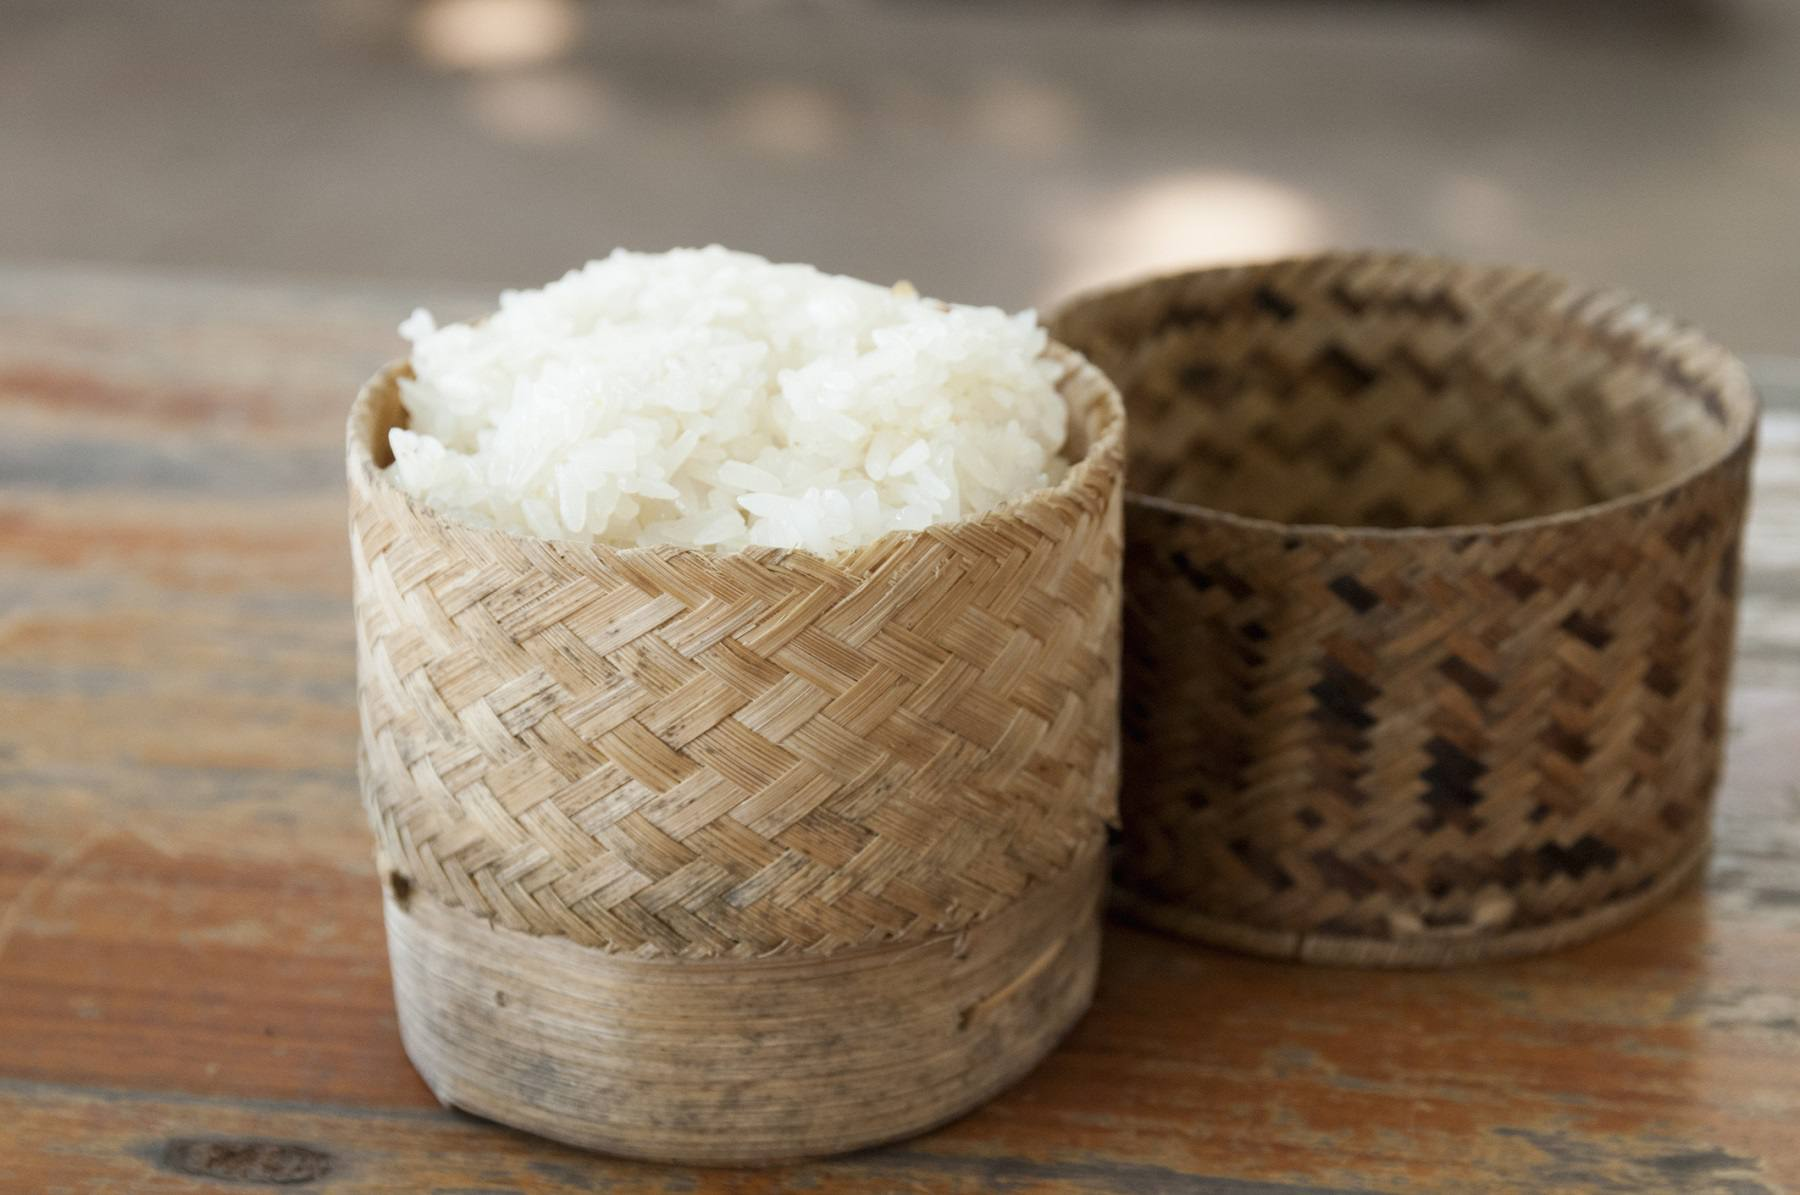 Un thip khao lleno de arroz pegajoso